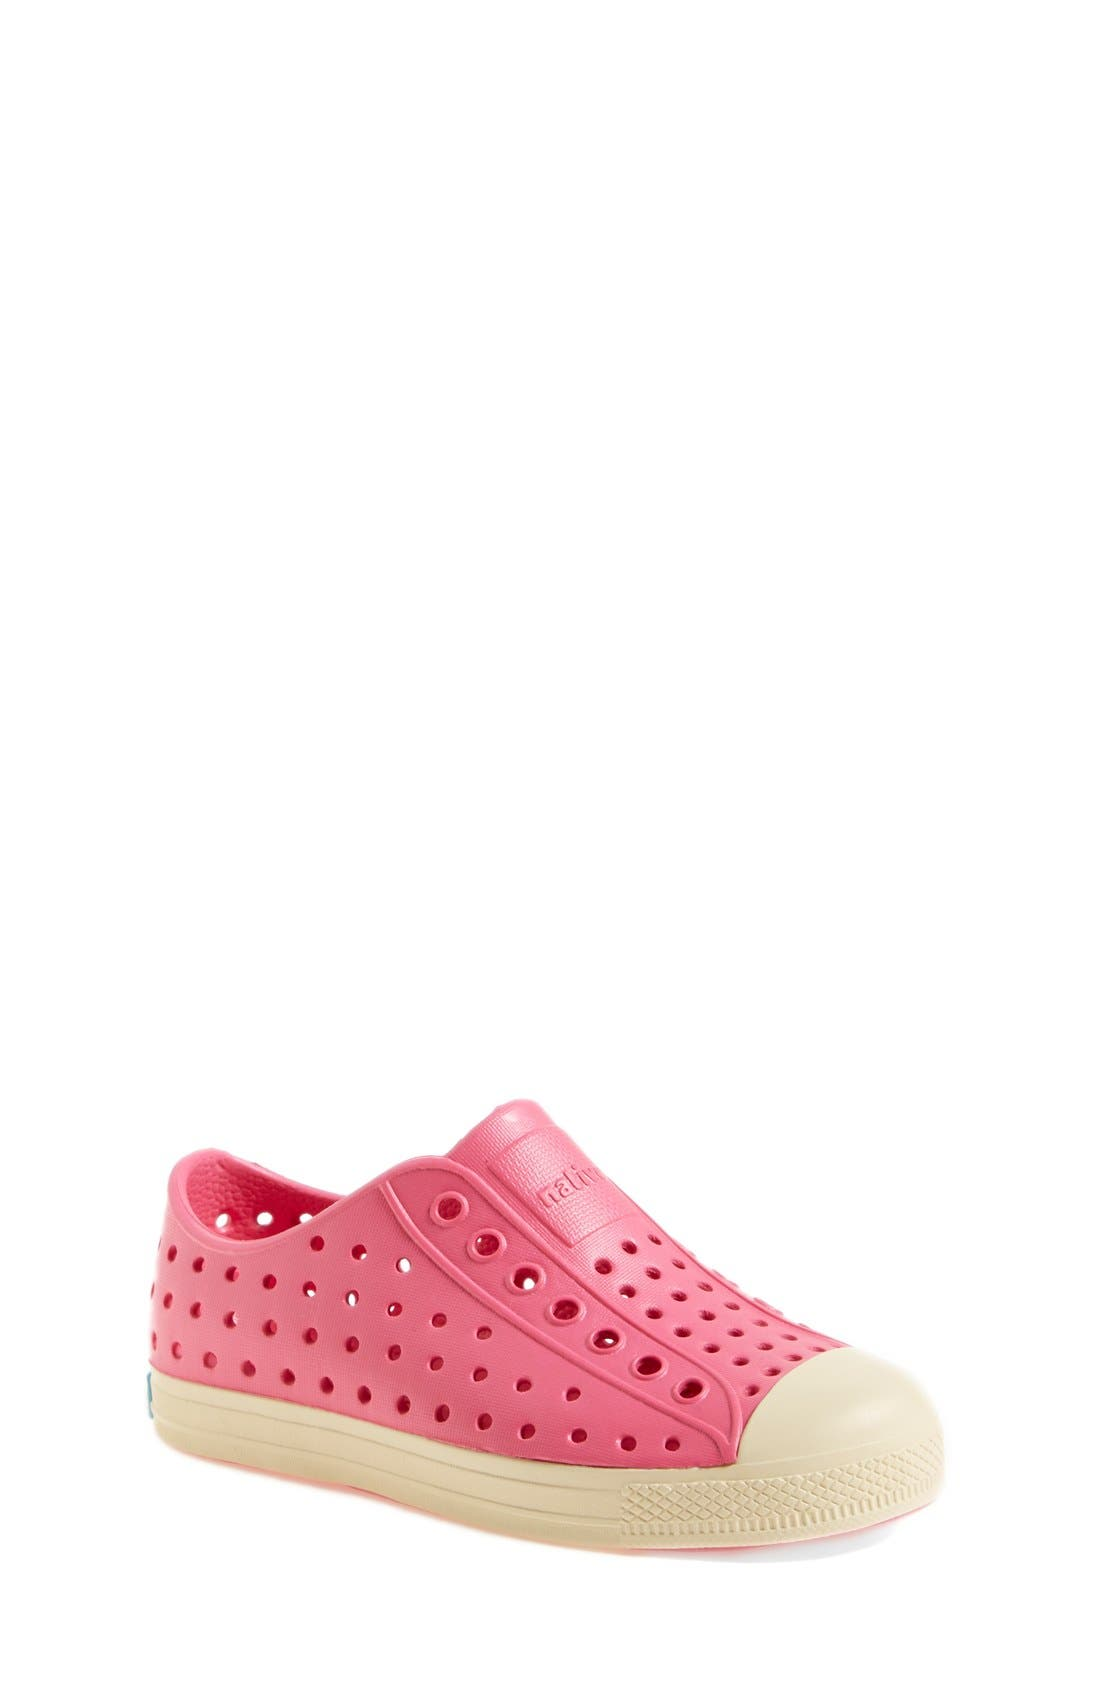 'Jefferson' Water Friendly Slip-On Sneaker,                             Main thumbnail 62, color,